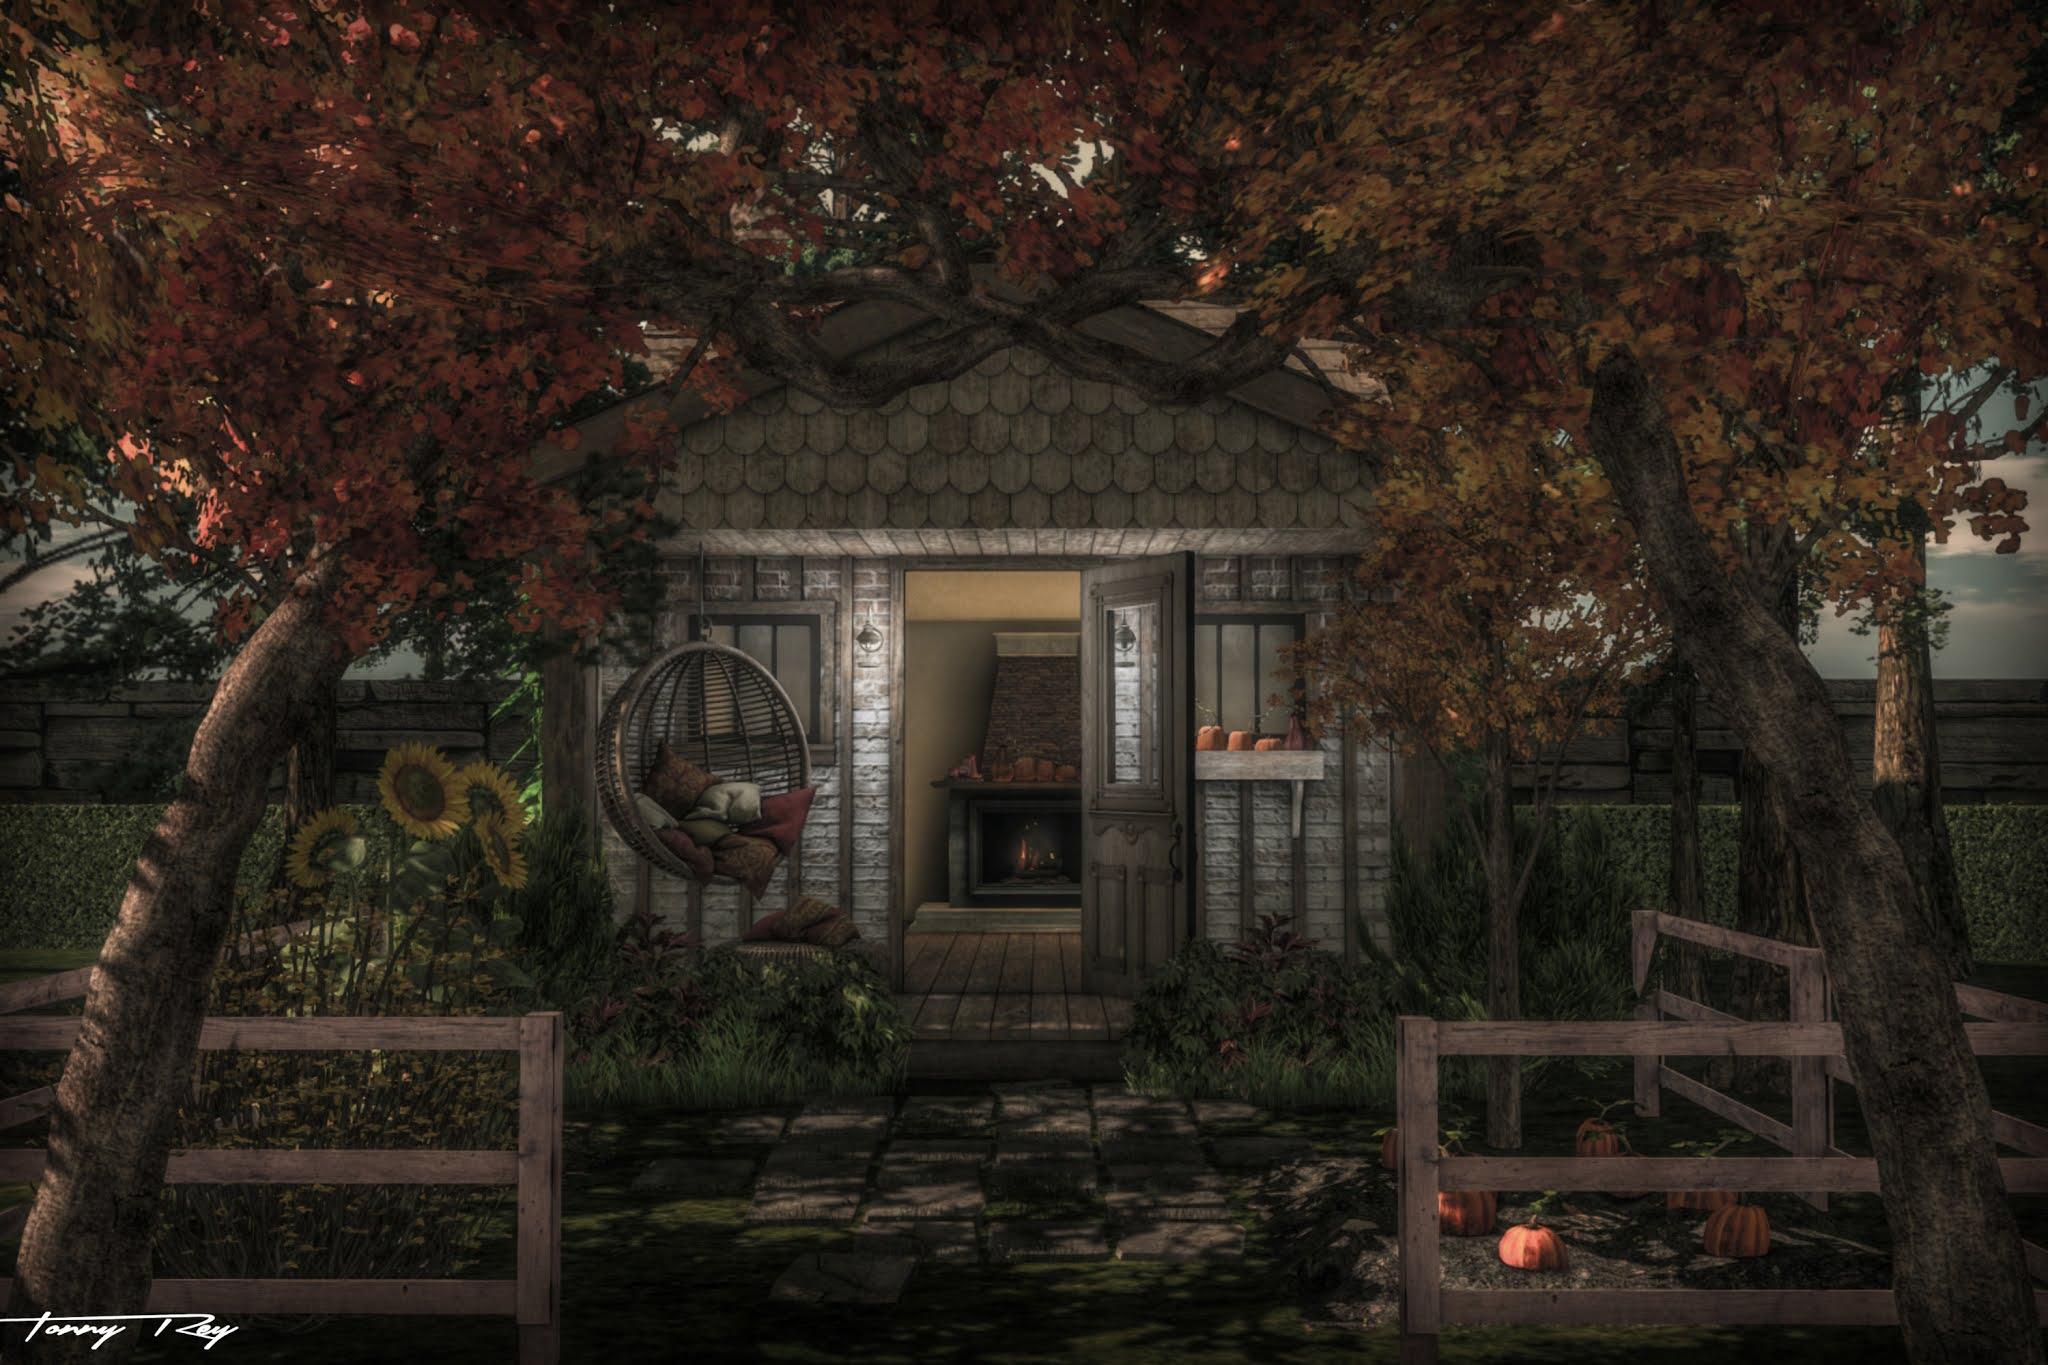 Swank Event - Country Garden...